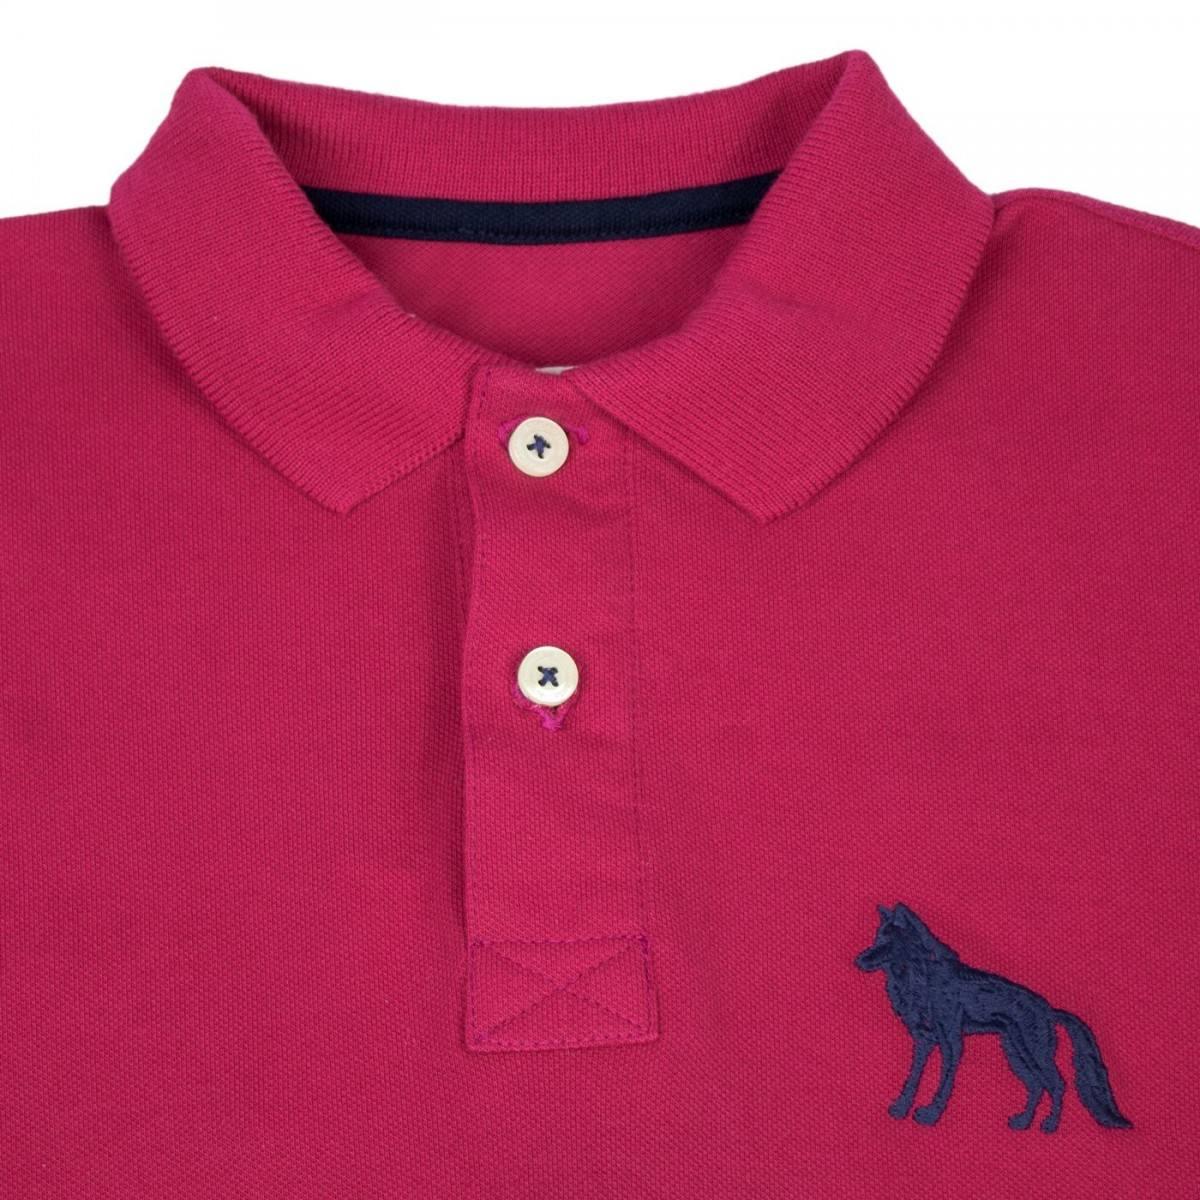 9c4b01f15 camisa polo infantil masculina acostamento manga curta. Carregando zoom.